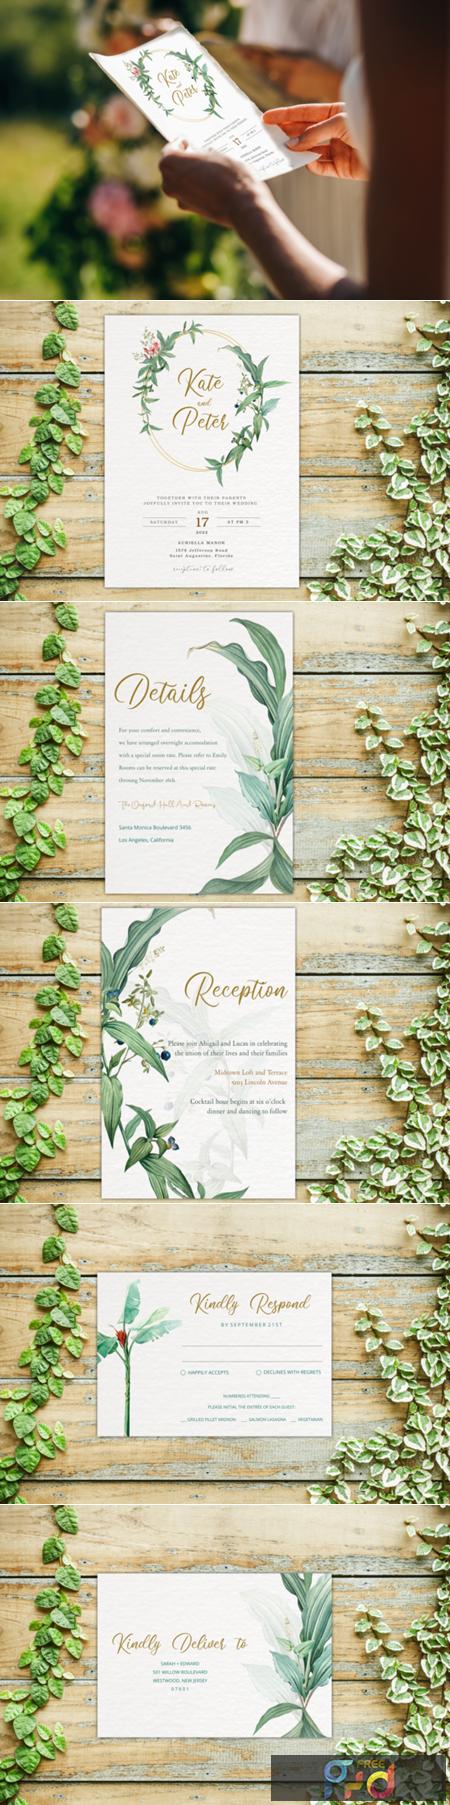 Greenery Wedding Invitation Template Set 2933725 1